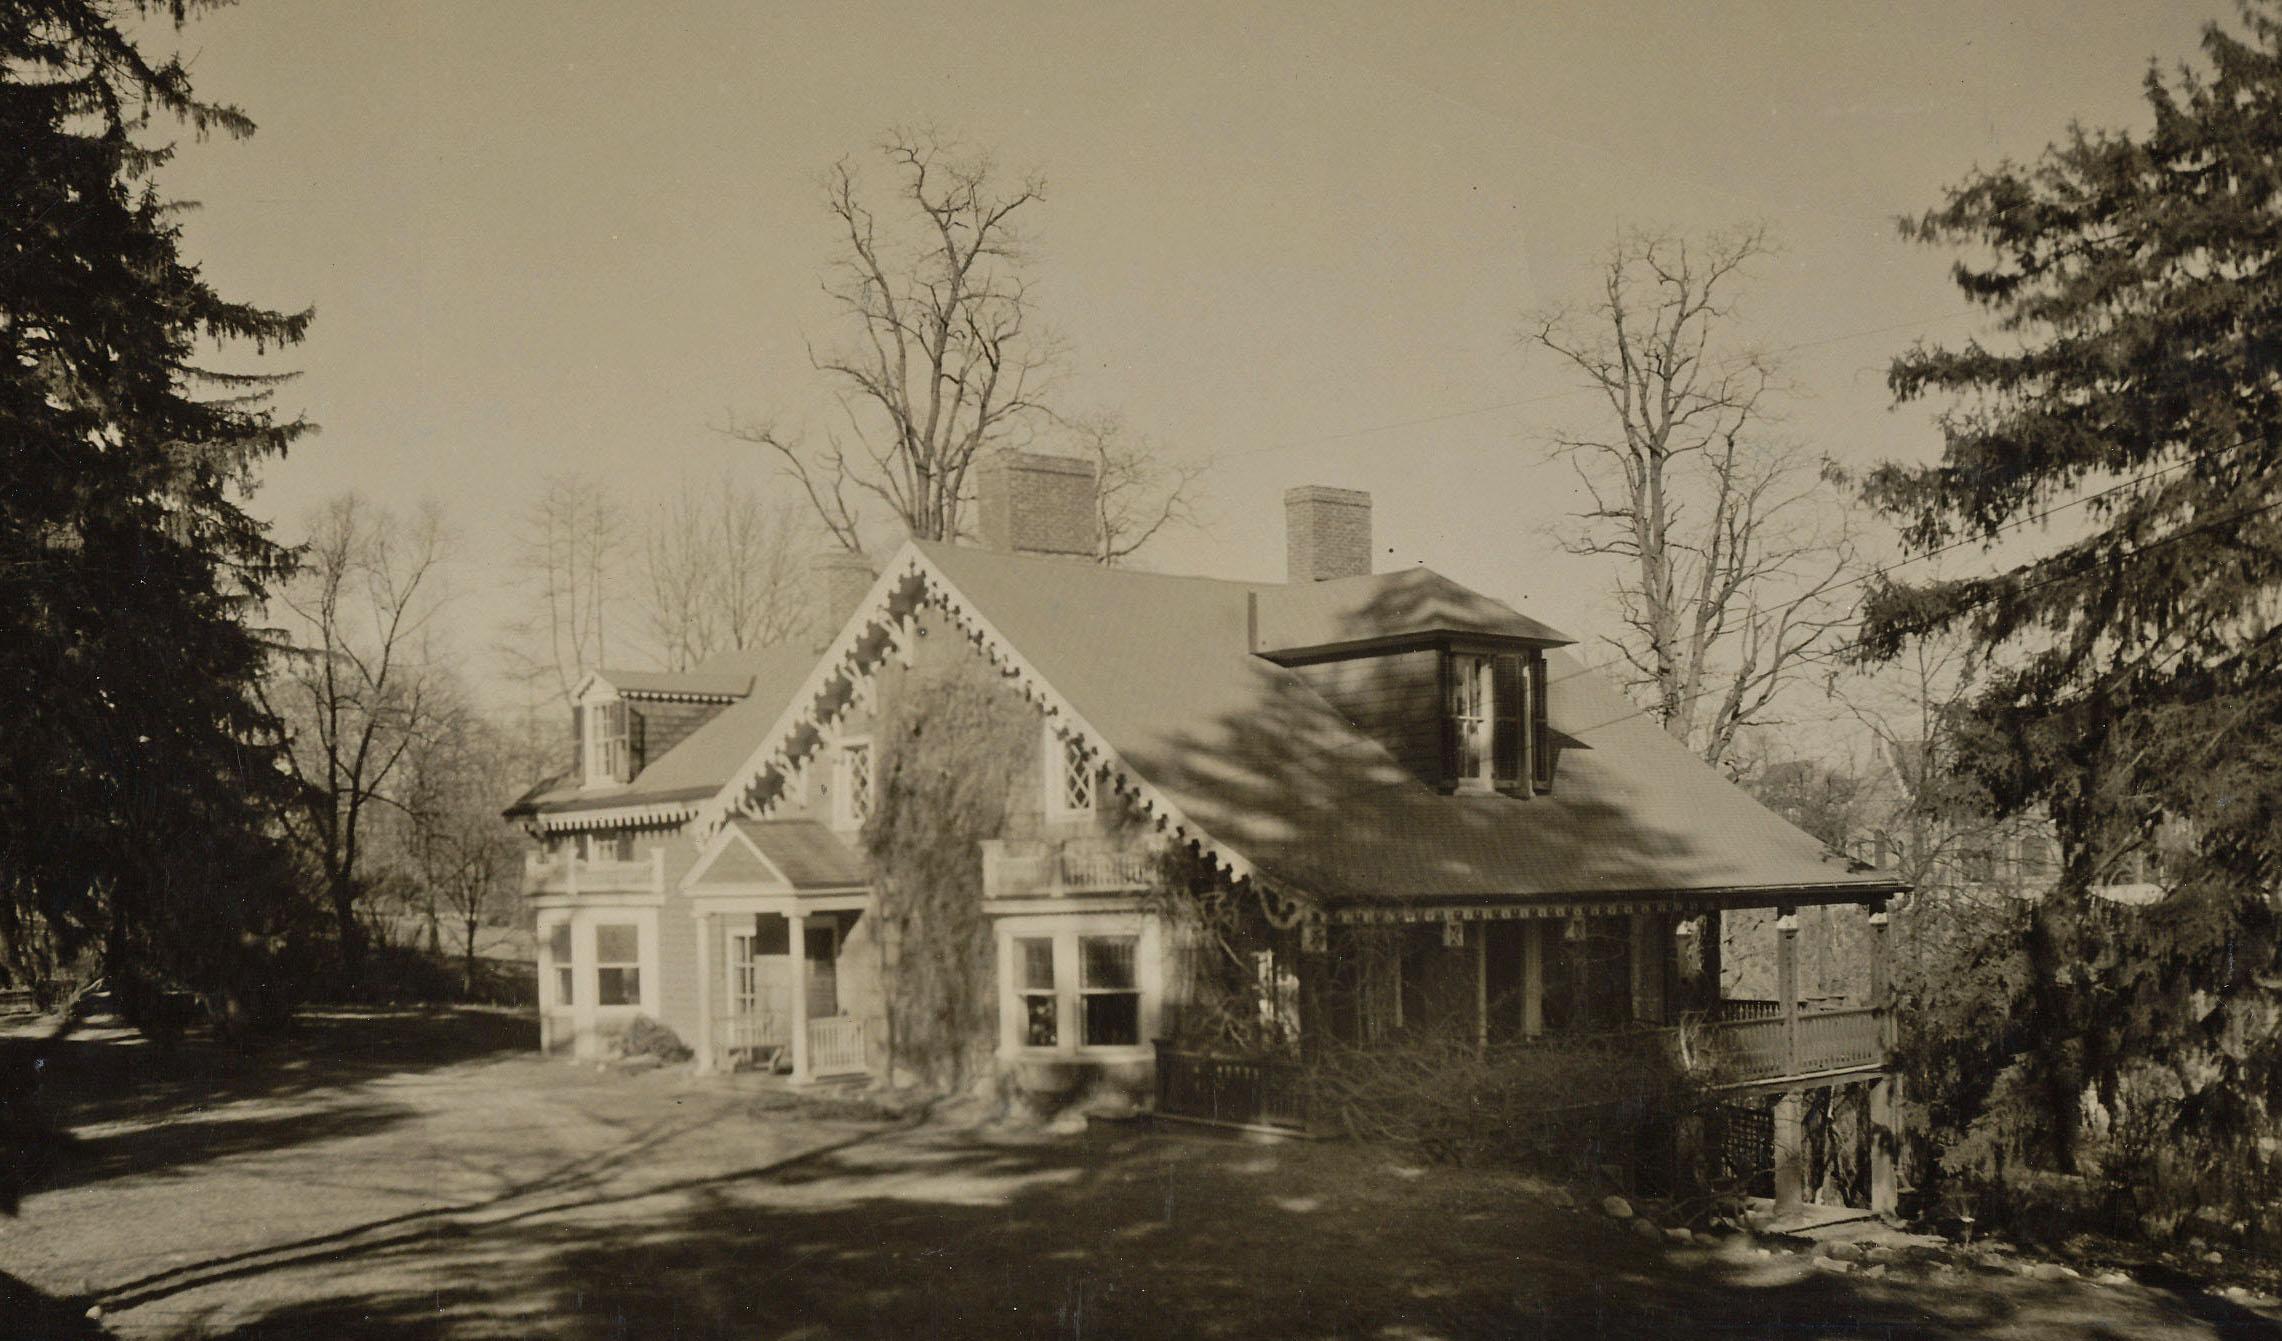 Crawford-Morris-Popham House, date unknown.